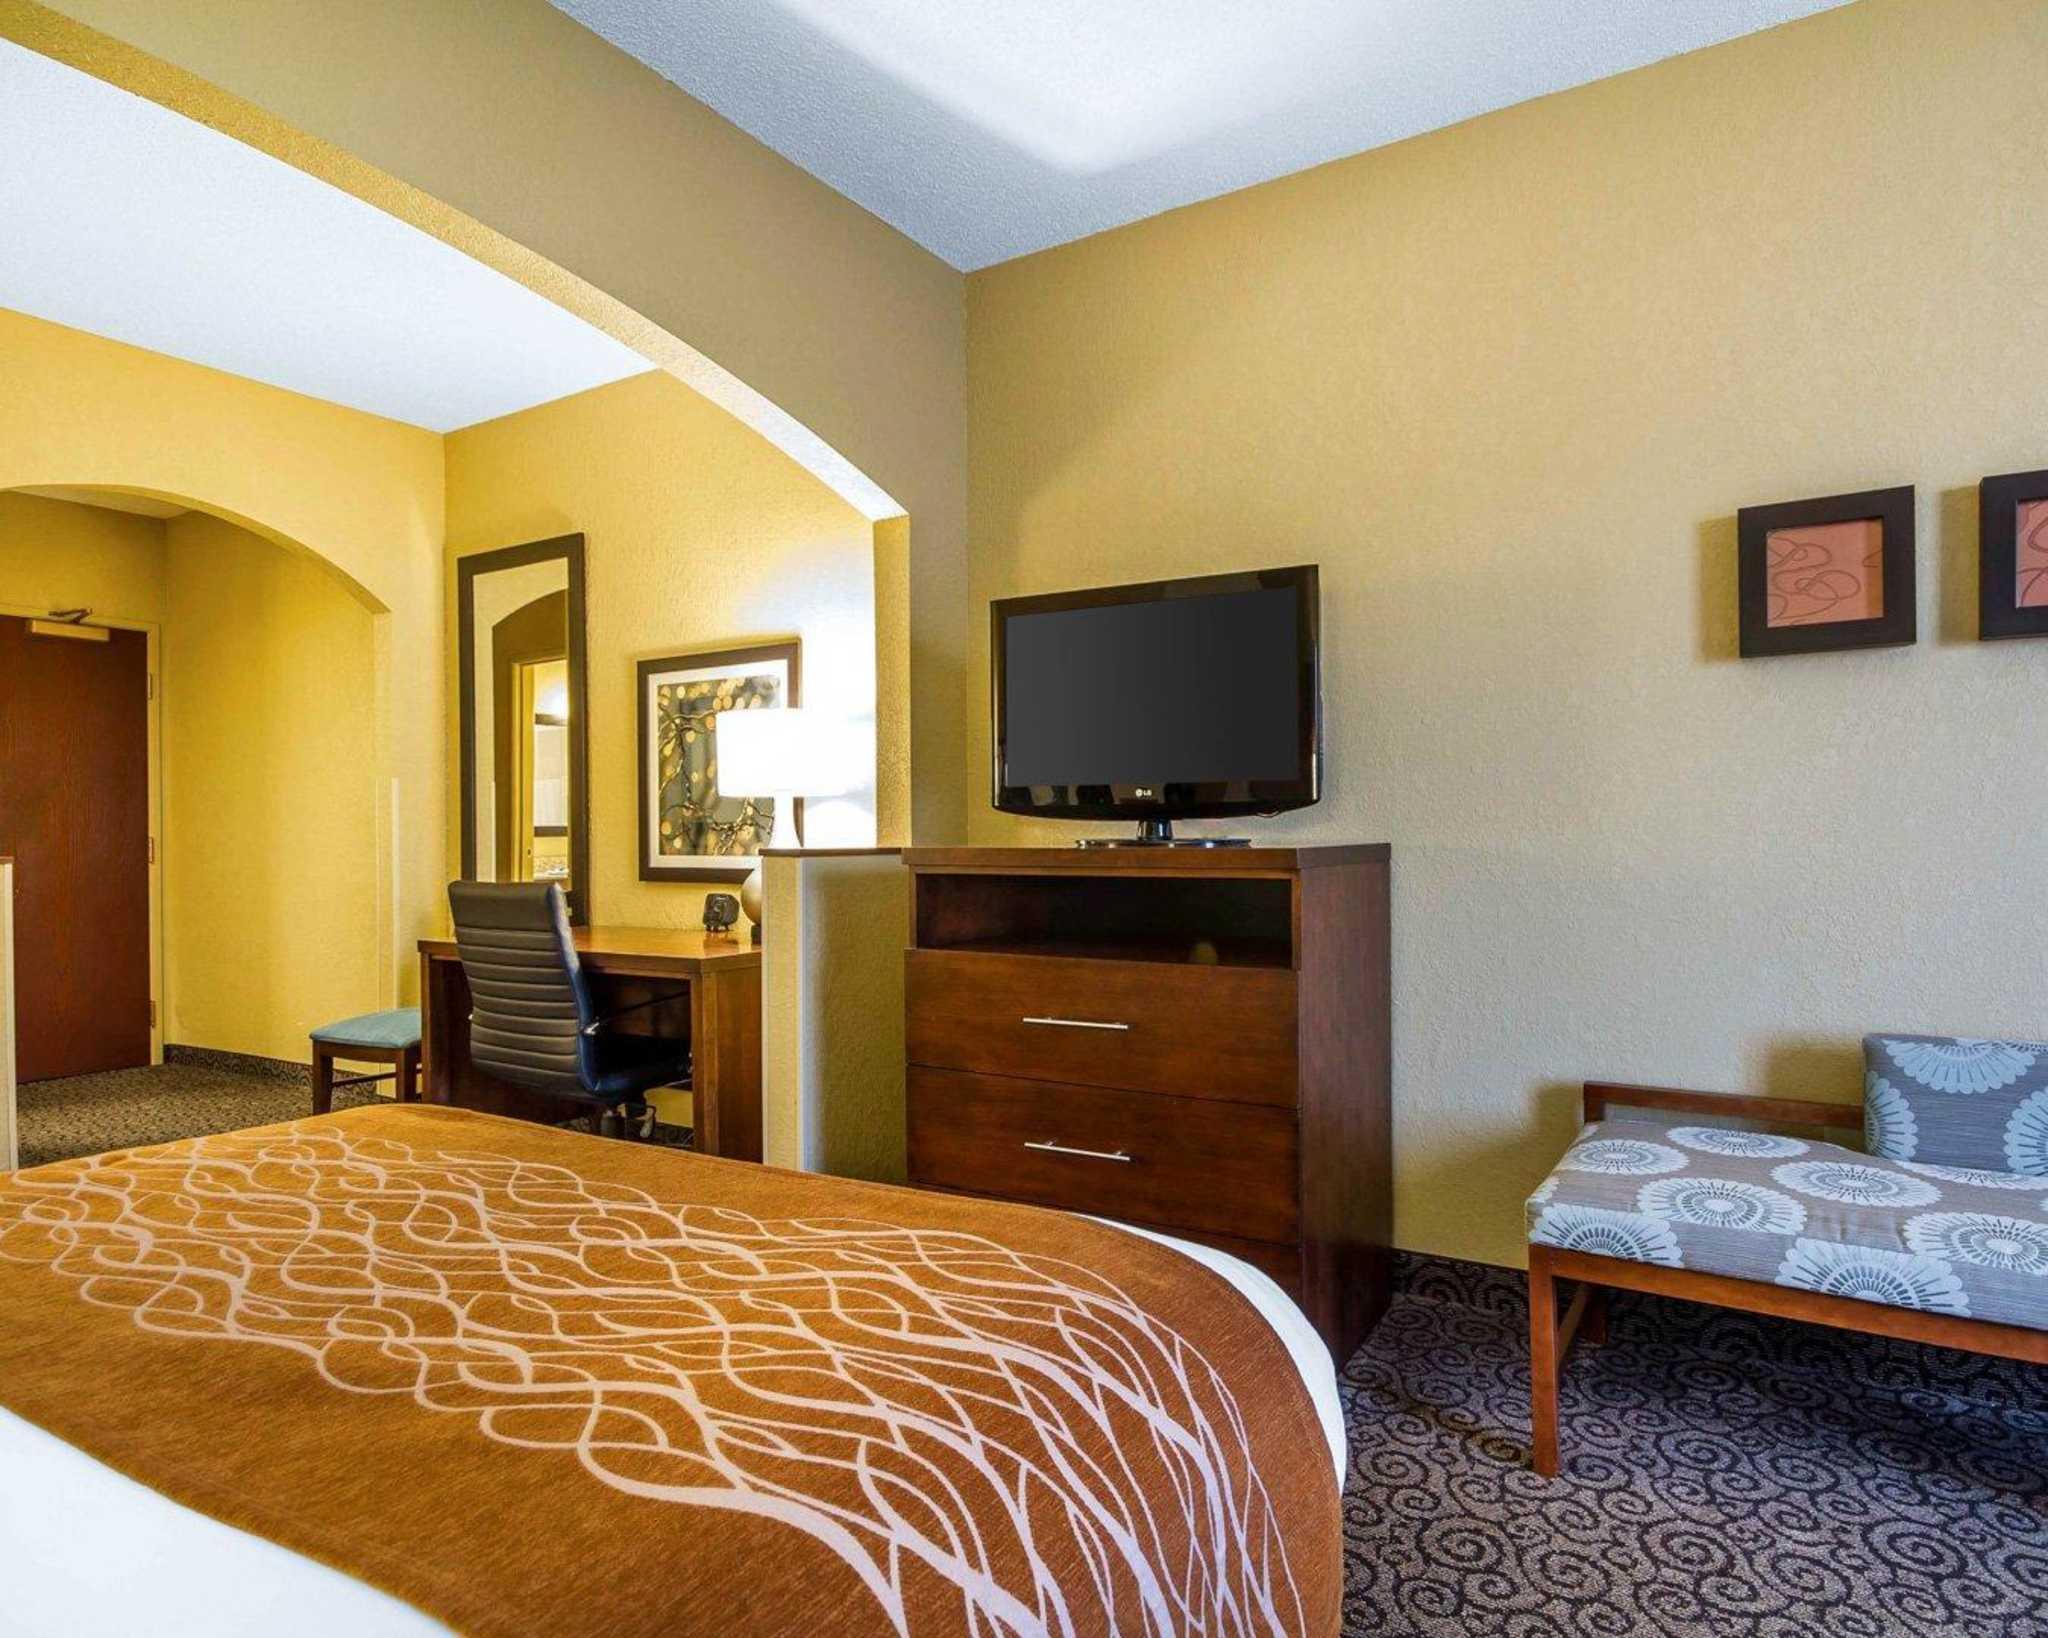 Comfort Suites image 3